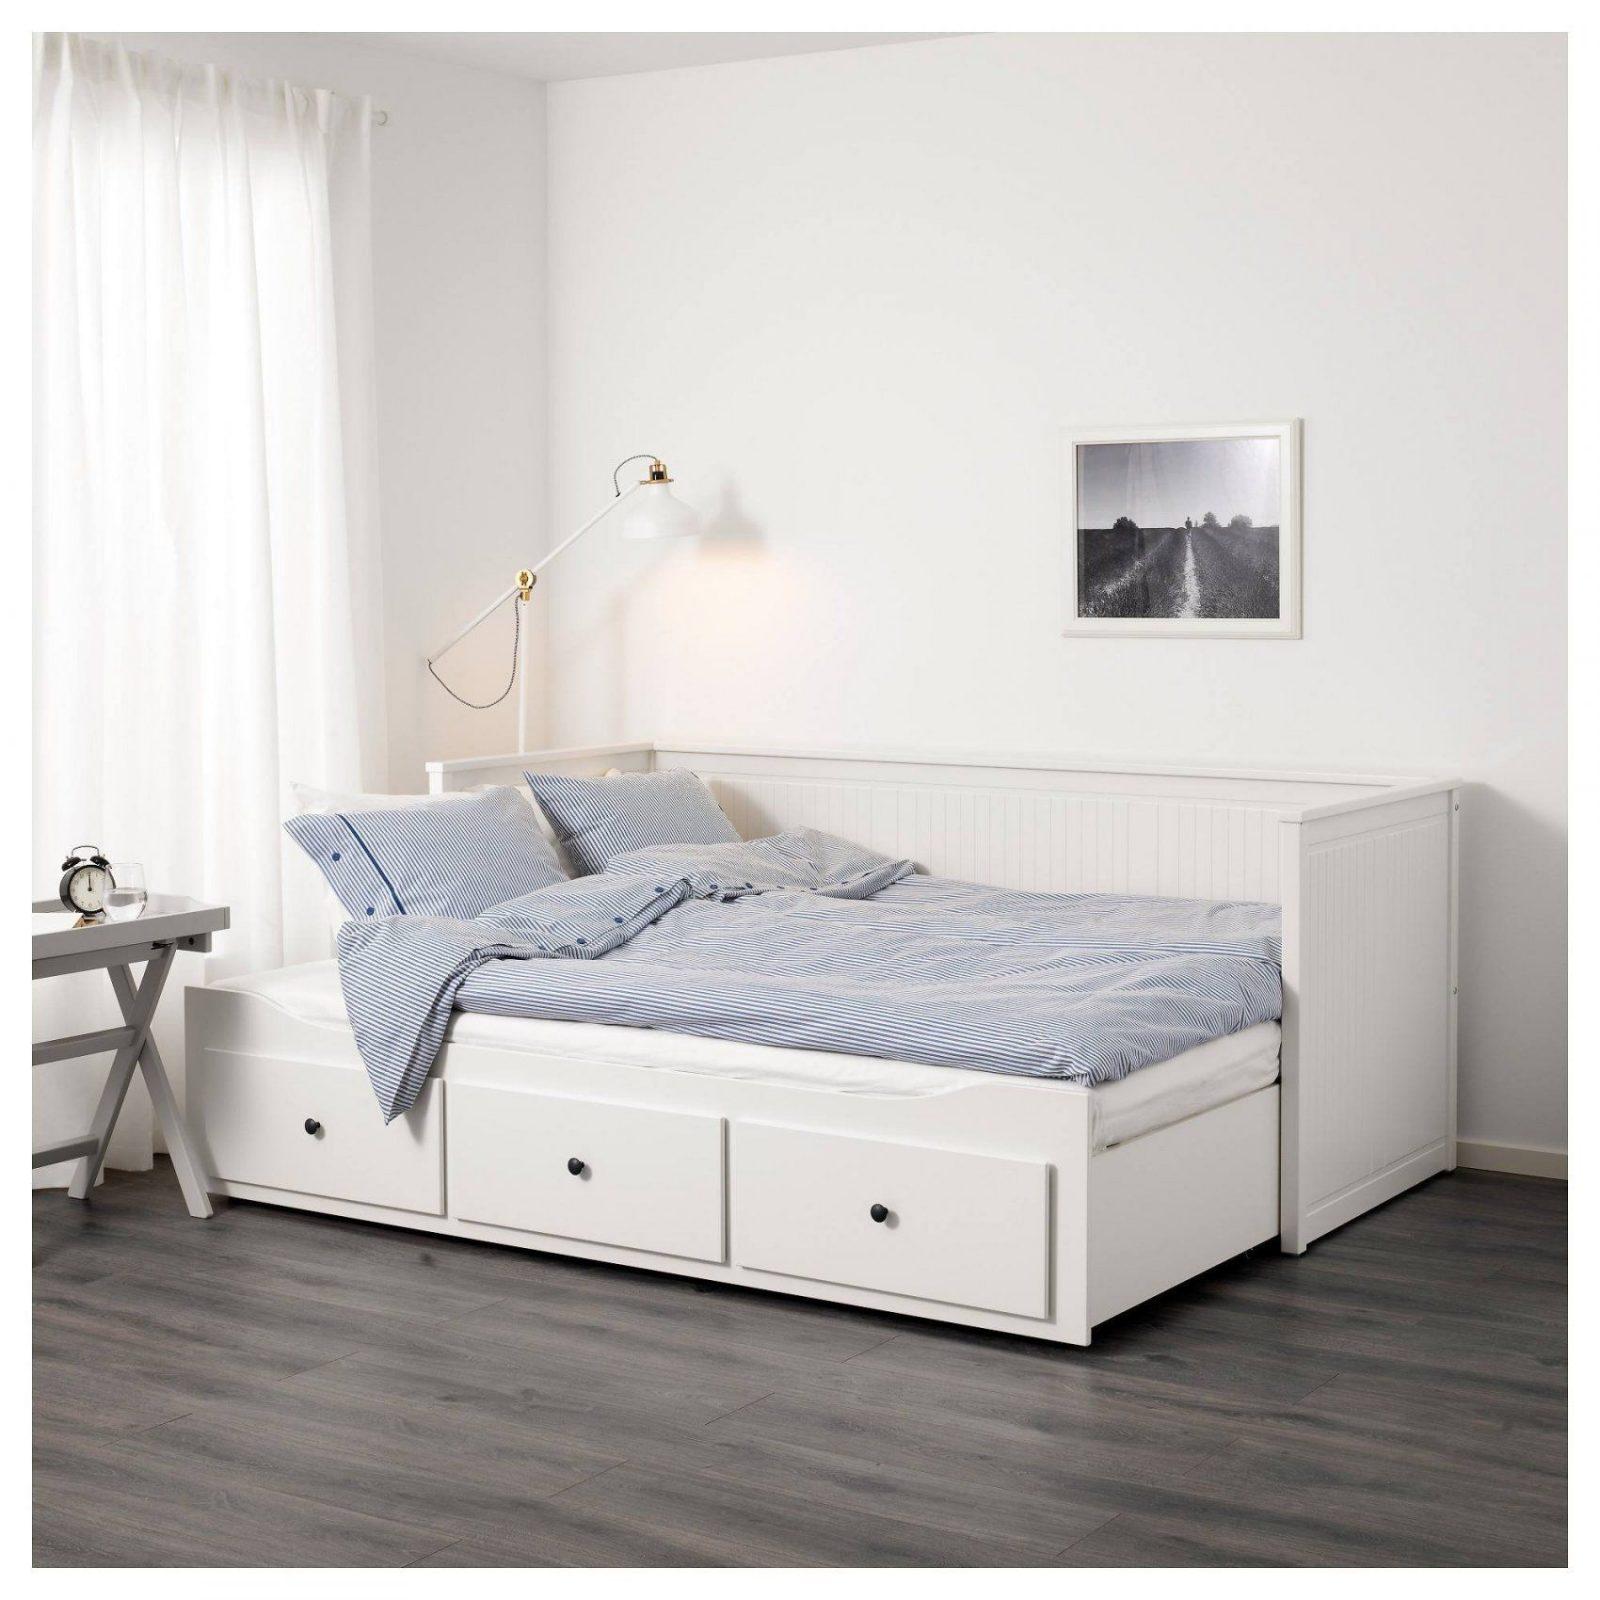 Ikea Weisses Bett Atemberaubend Inspiration Über Ikea Weisses Bett ...